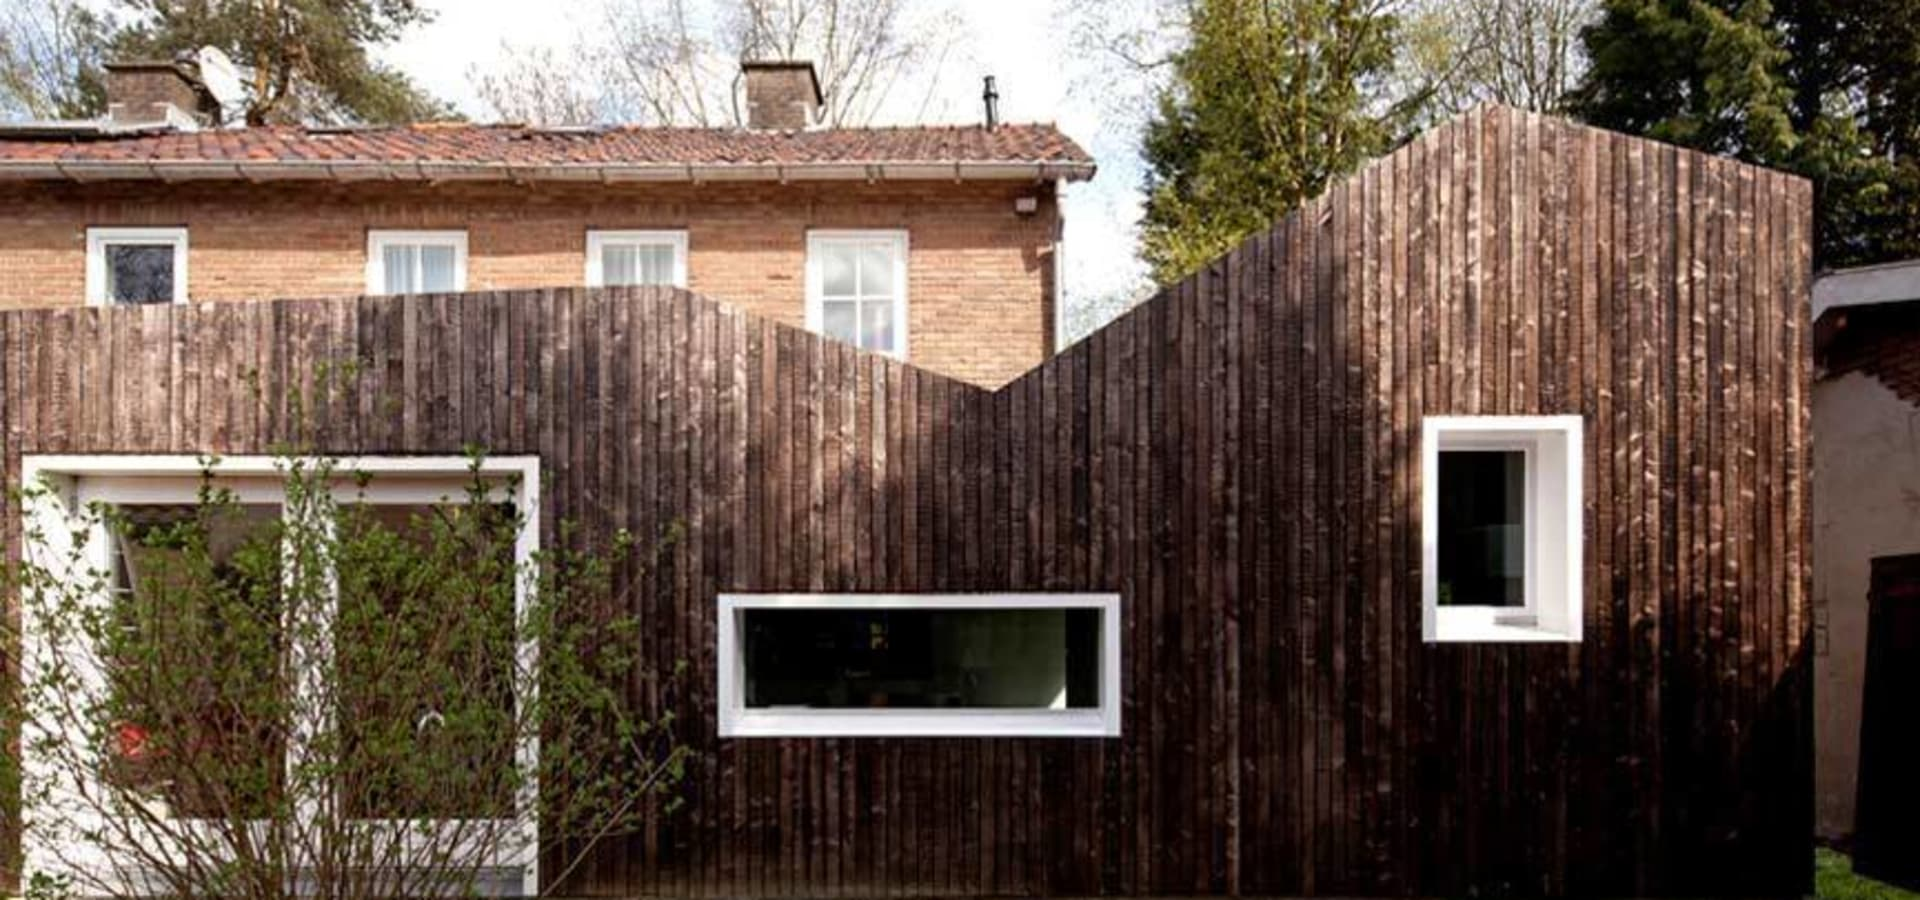 Richel Lubbers Architecten